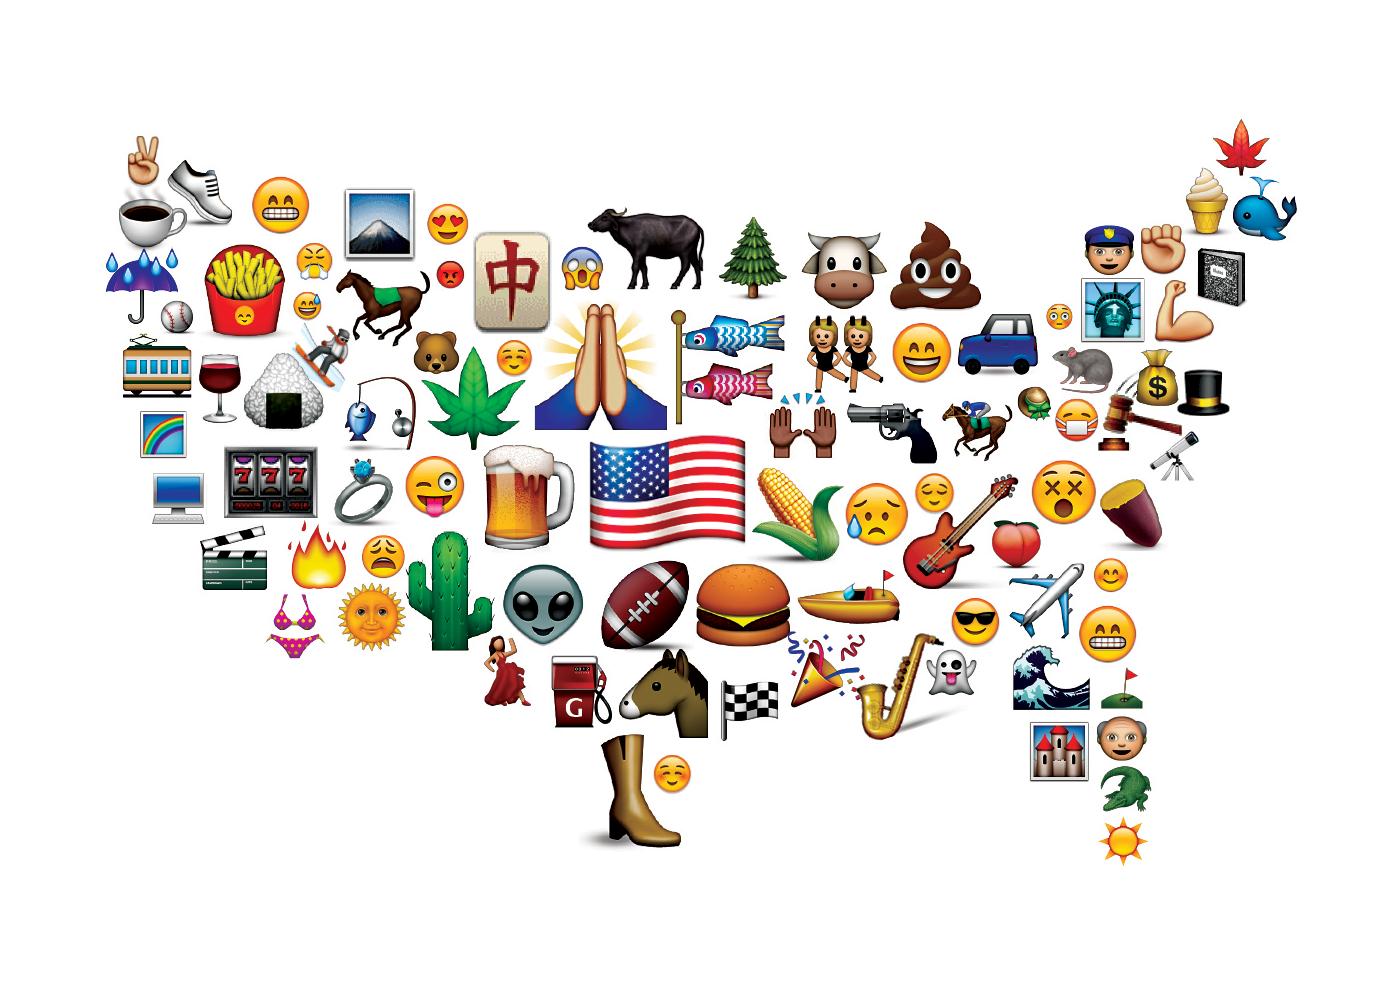 EmojiAmerica